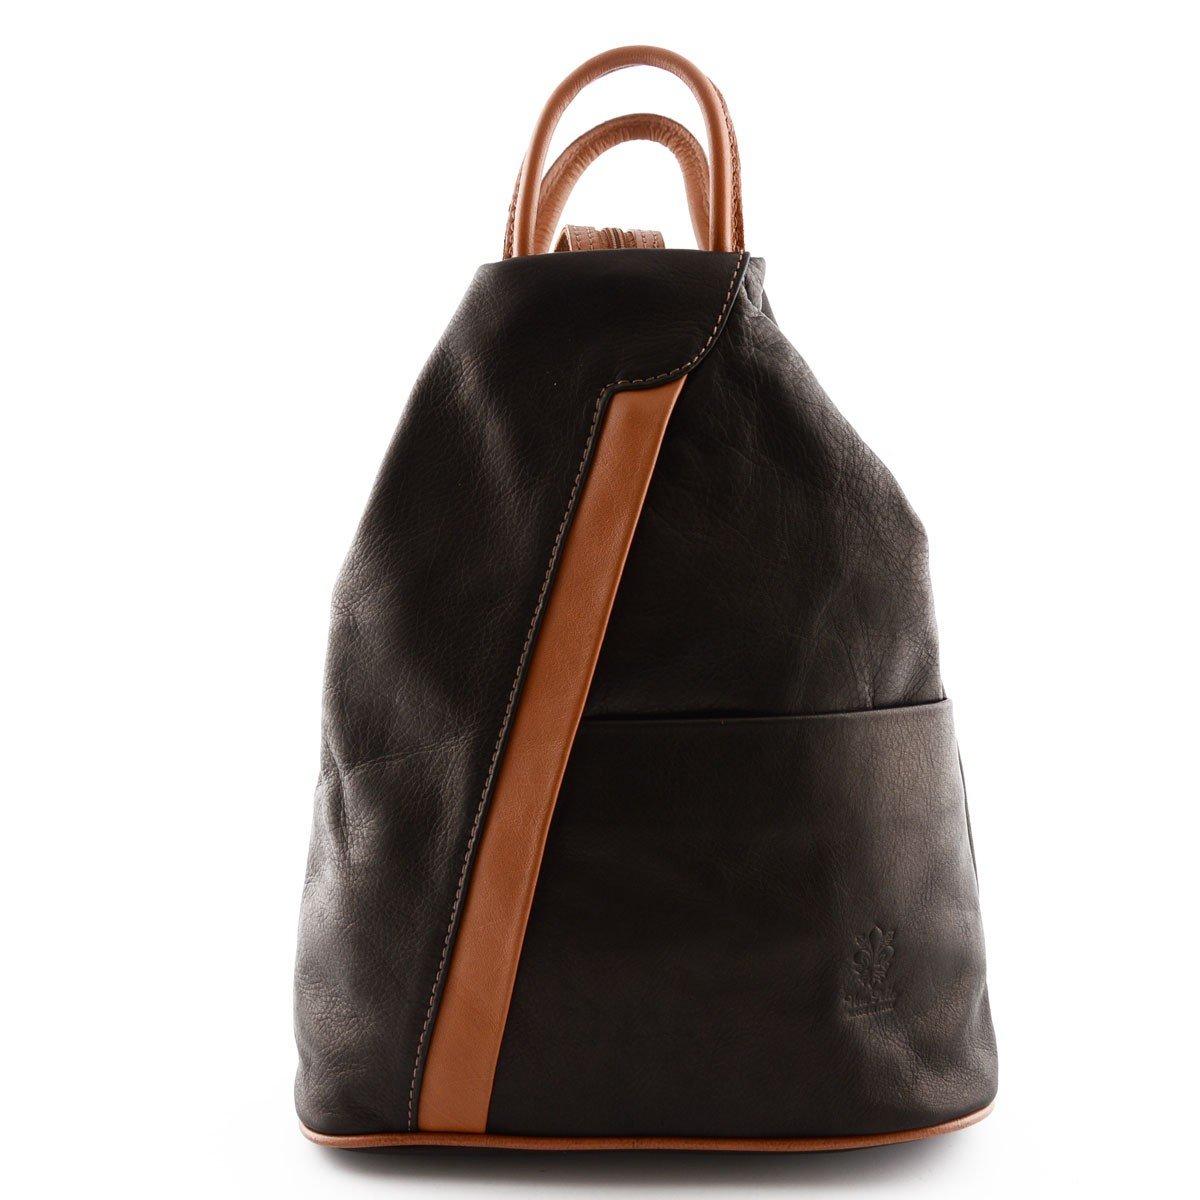 Woman Leather Backpack Color Dark Brown Cognac